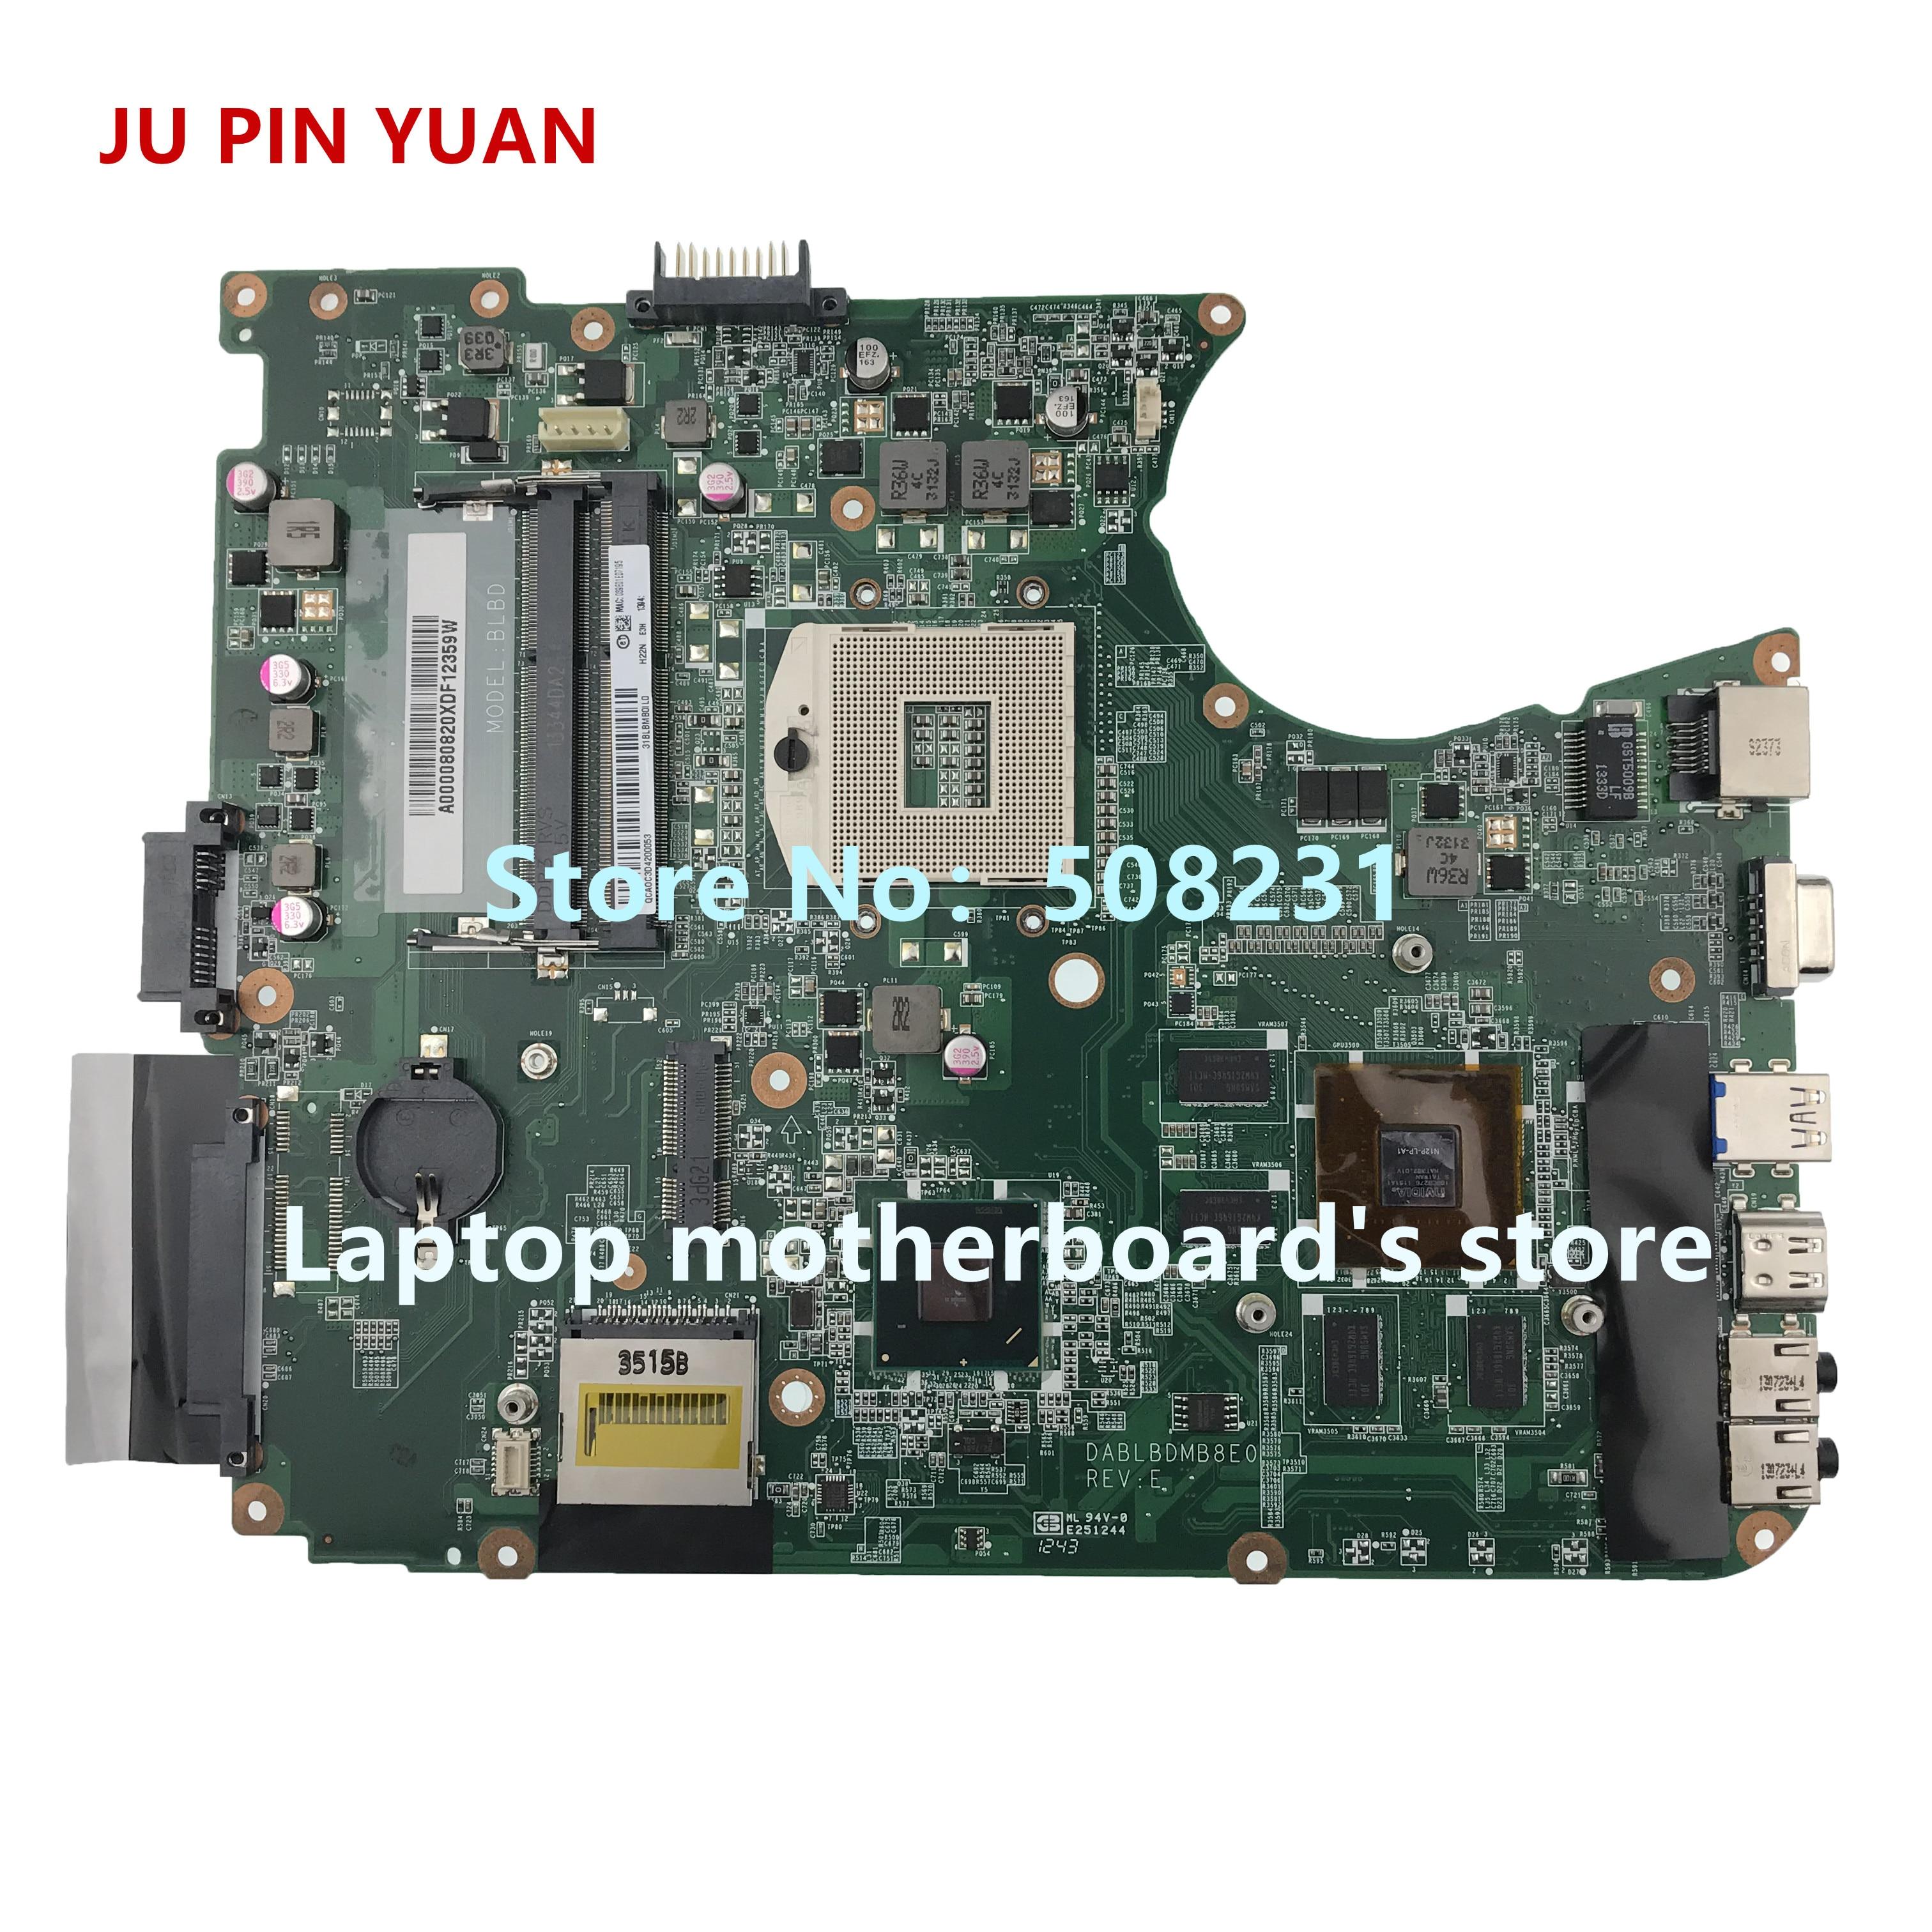 JU PIN YUAN For toshiba satellite L750 L755 laptop motherboard A000080820 DABLBDMB8E0 GT525M 1GB 100% fully TestedJU PIN YUAN For toshiba satellite L750 L755 laptop motherboard A000080820 DABLBDMB8E0 GT525M 1GB 100% fully Tested